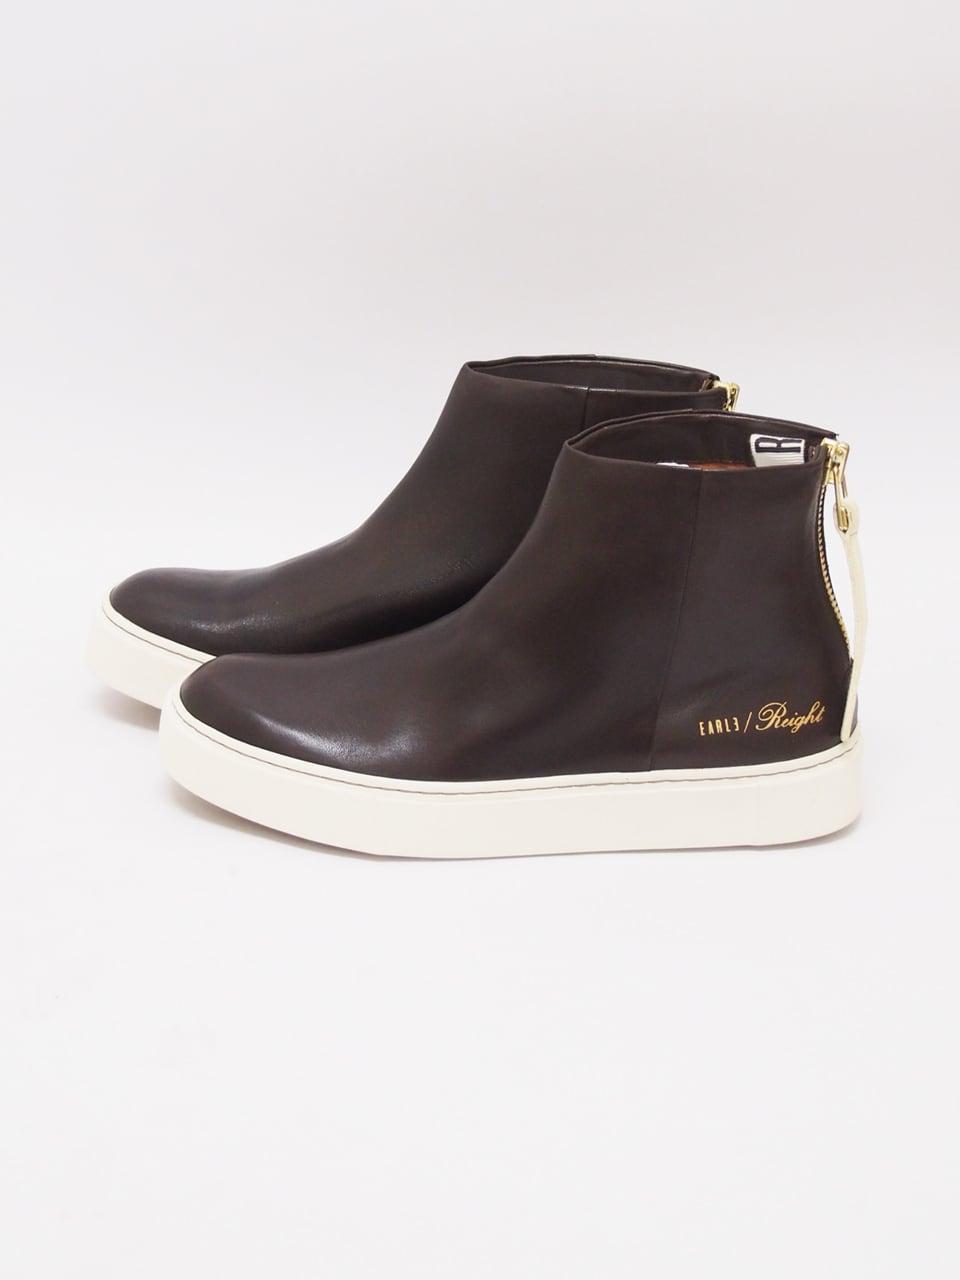 EARLE (アール) Back zip sneaker boots / DARK BROWN ER8406-2